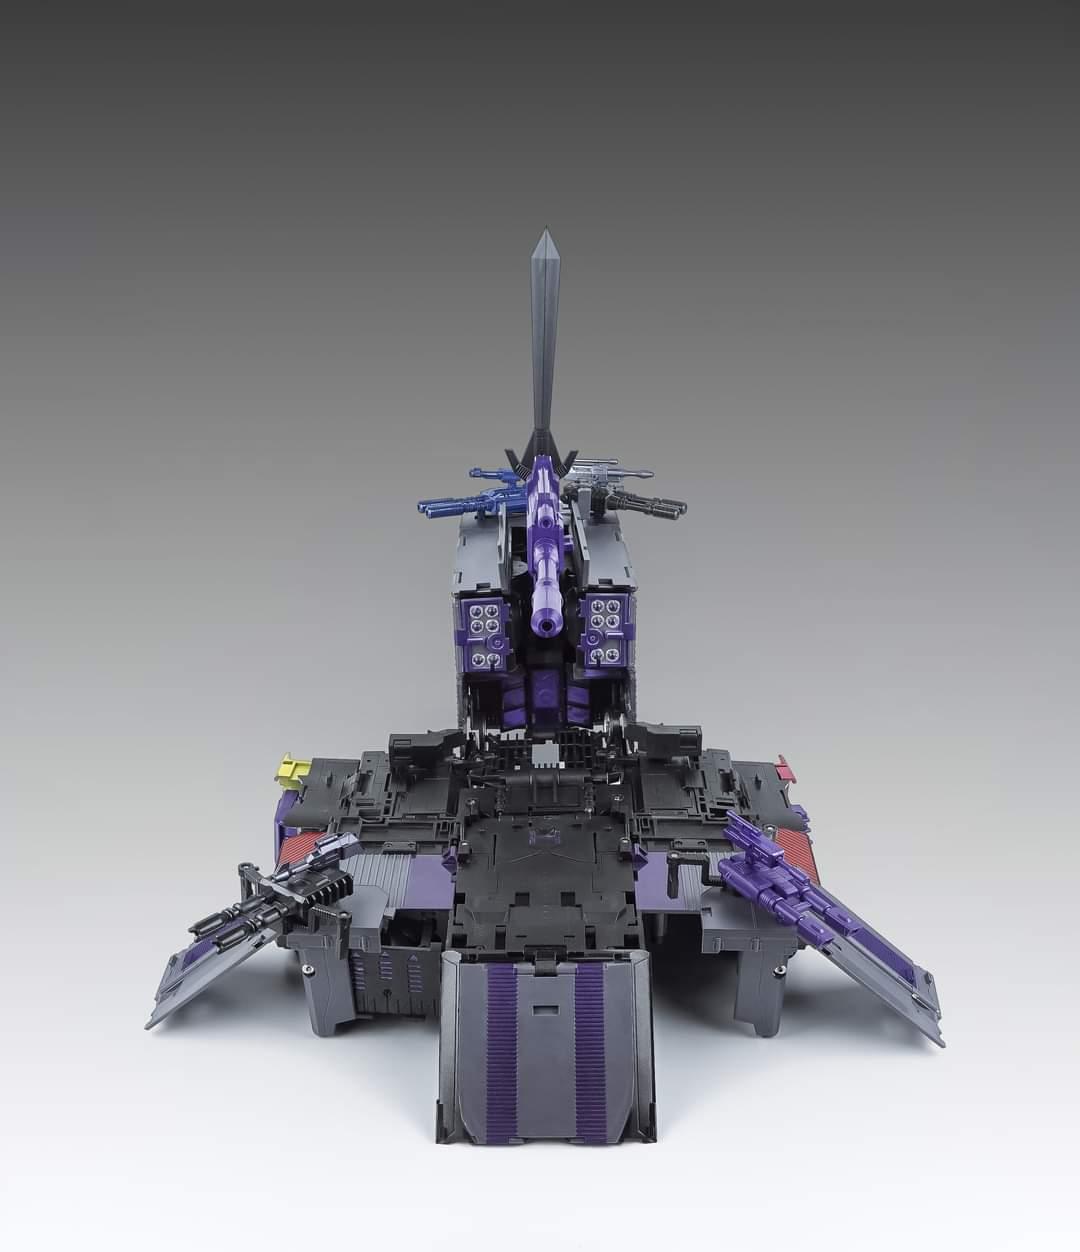 [X-Transbots] Produit Tiers - Jouets Berserkars forme Monolith (MX-XIII à MX-VII) - aka Stunticons forme Menasor/Menaseur - Page 7 7BhbRyL7_o